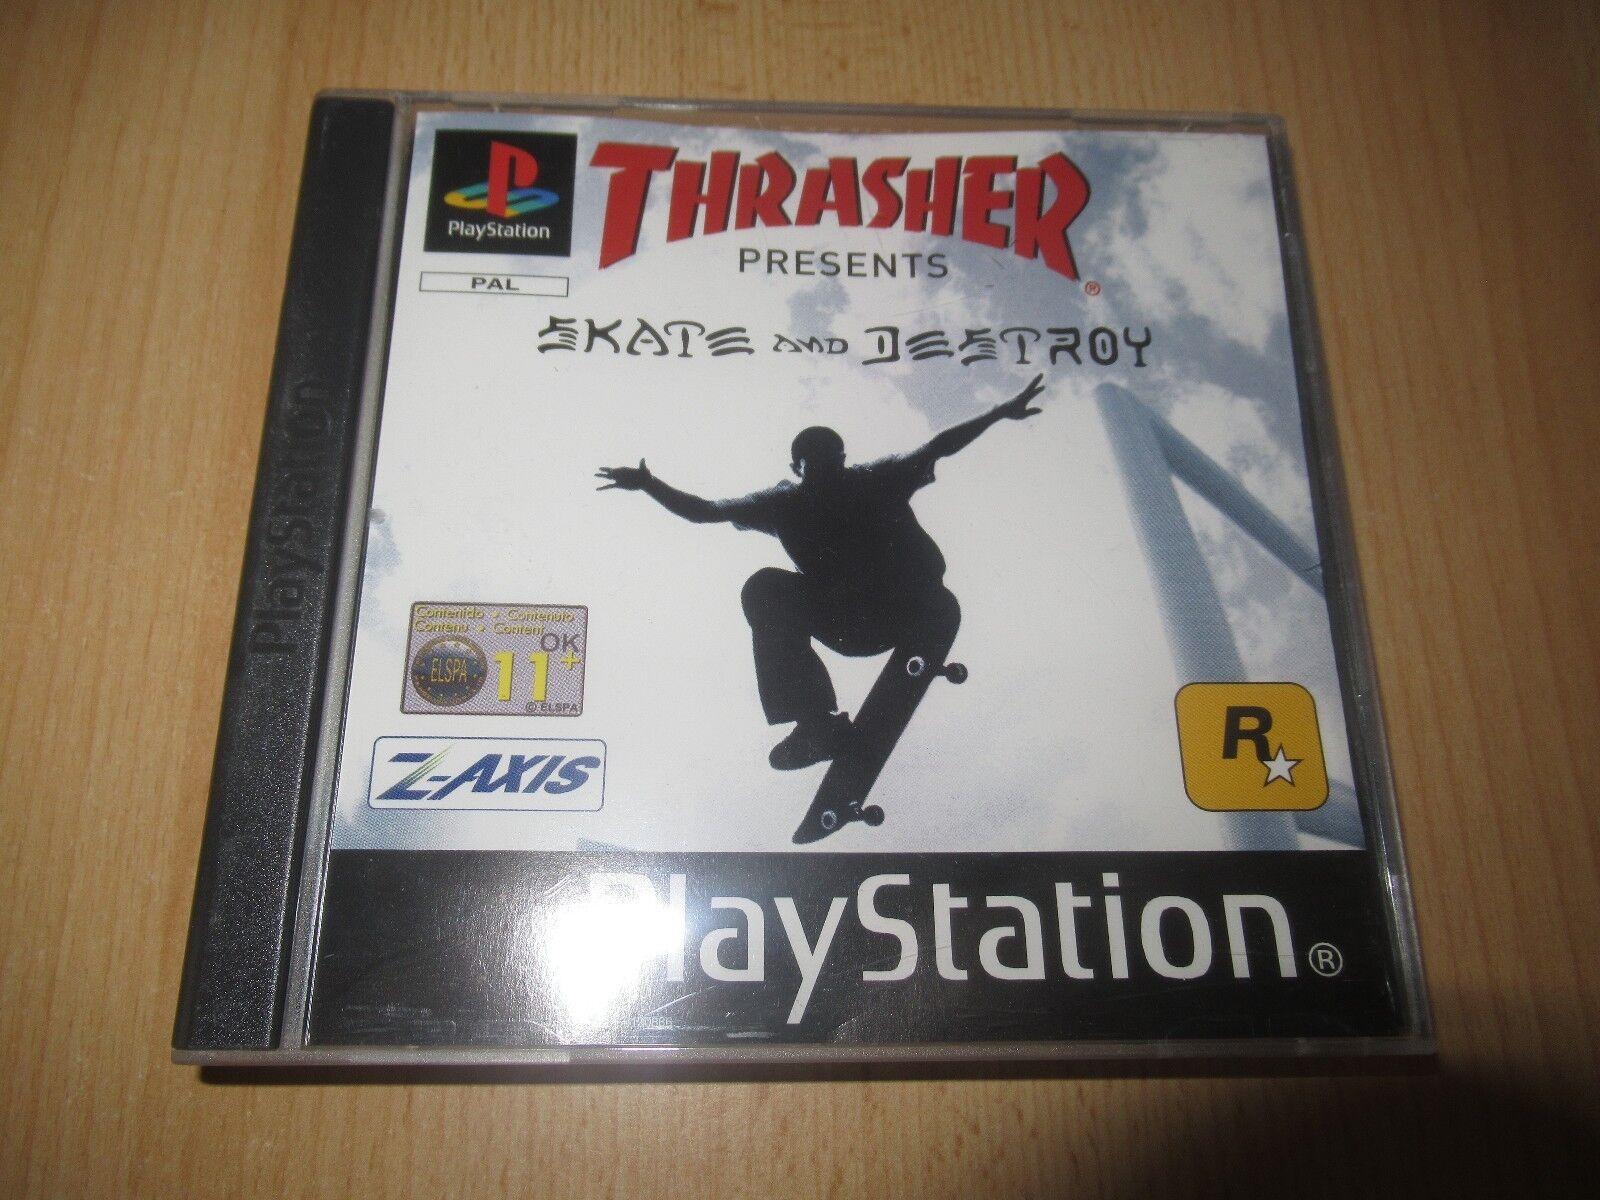 thrasher presents skate and destroy soundtrack